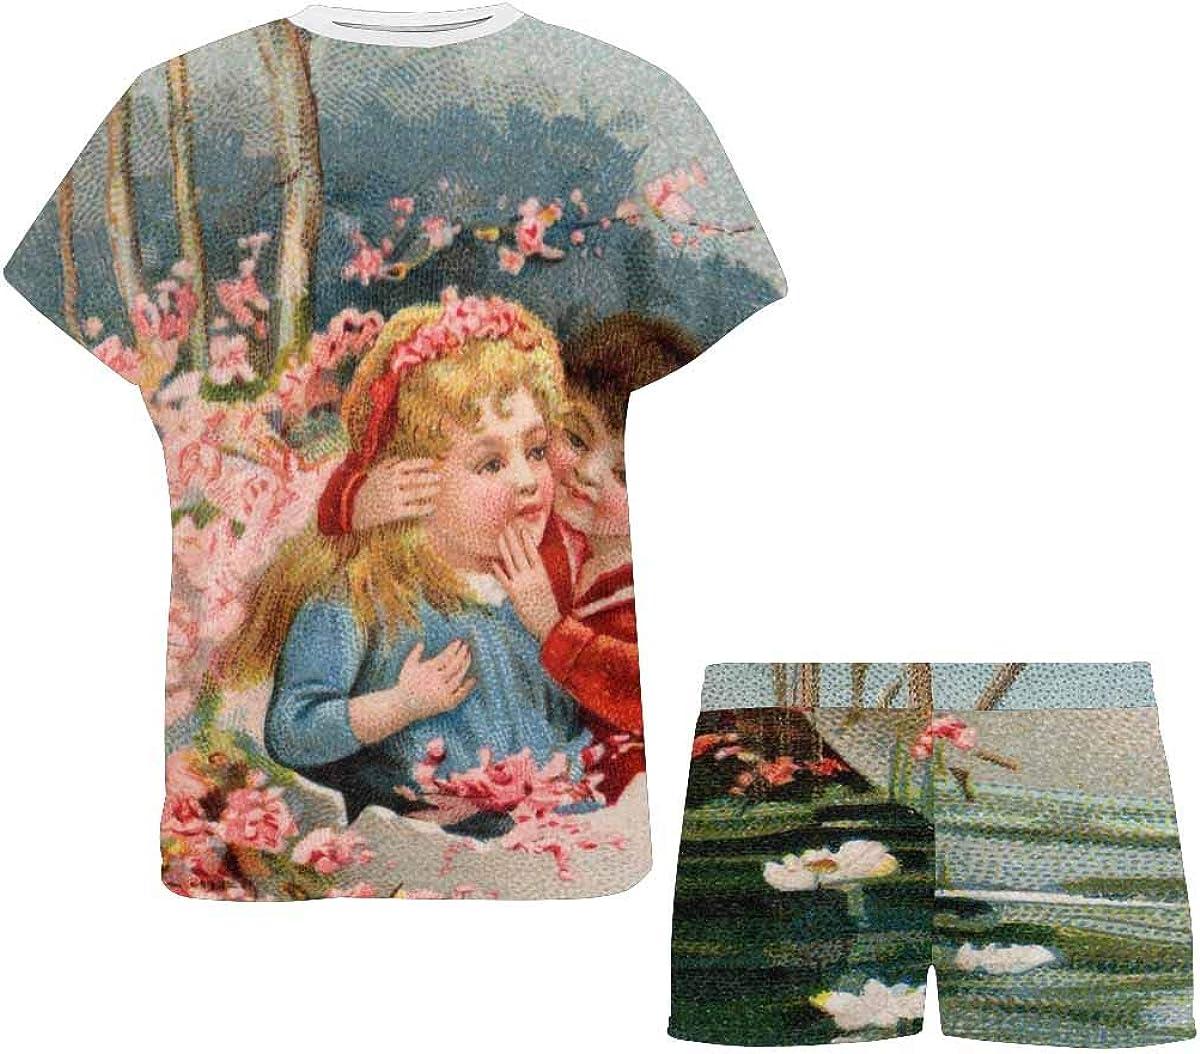 INTERESTPRINT Vintage Easter Rabbit Lake Women's Breathable 2 Piece Shorts Pajama Sleepwear Set